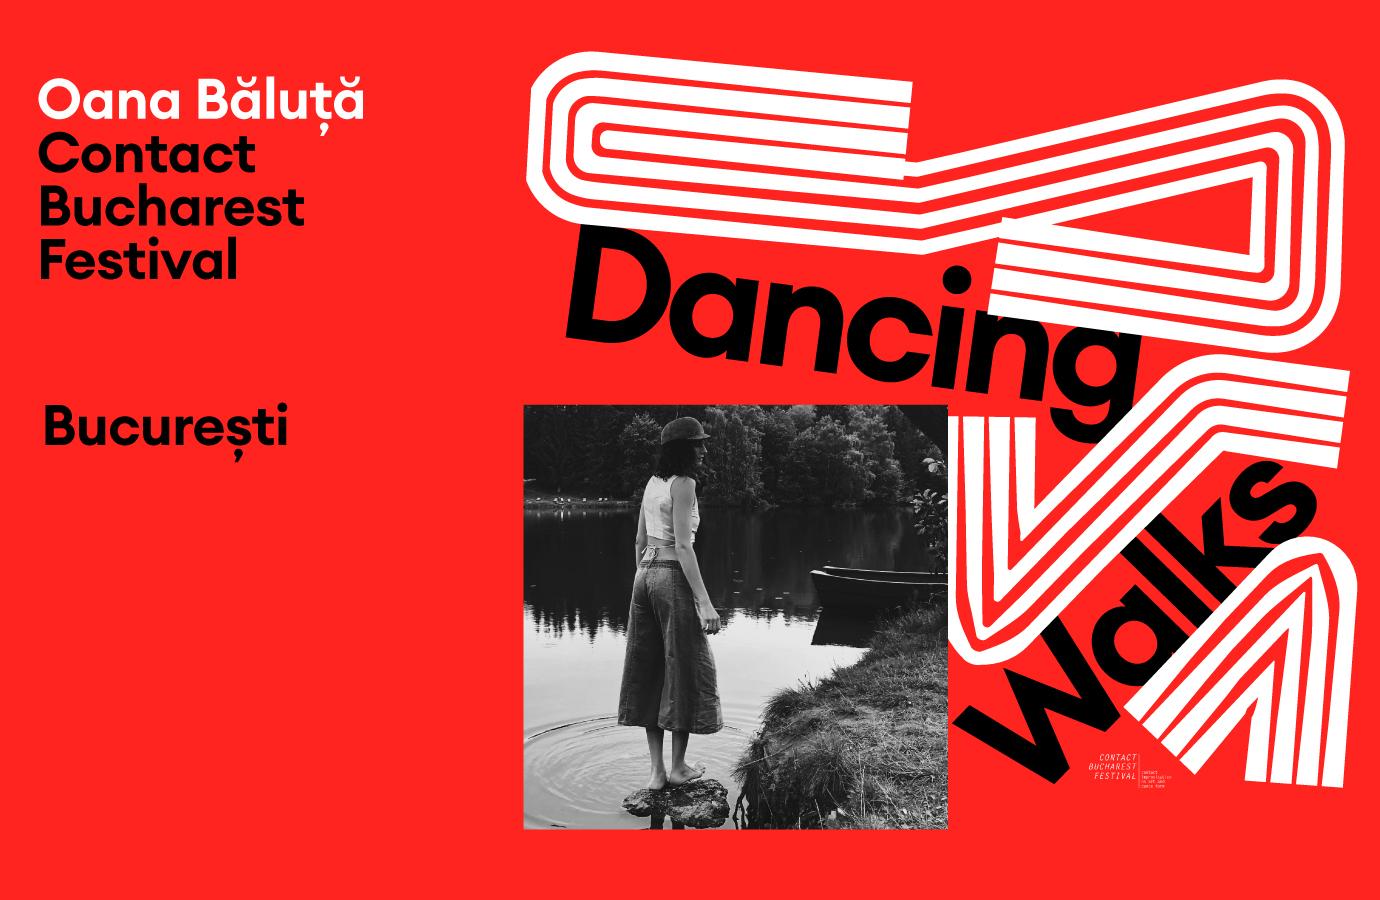 Dancing Walks - Contact Bucharest Festival